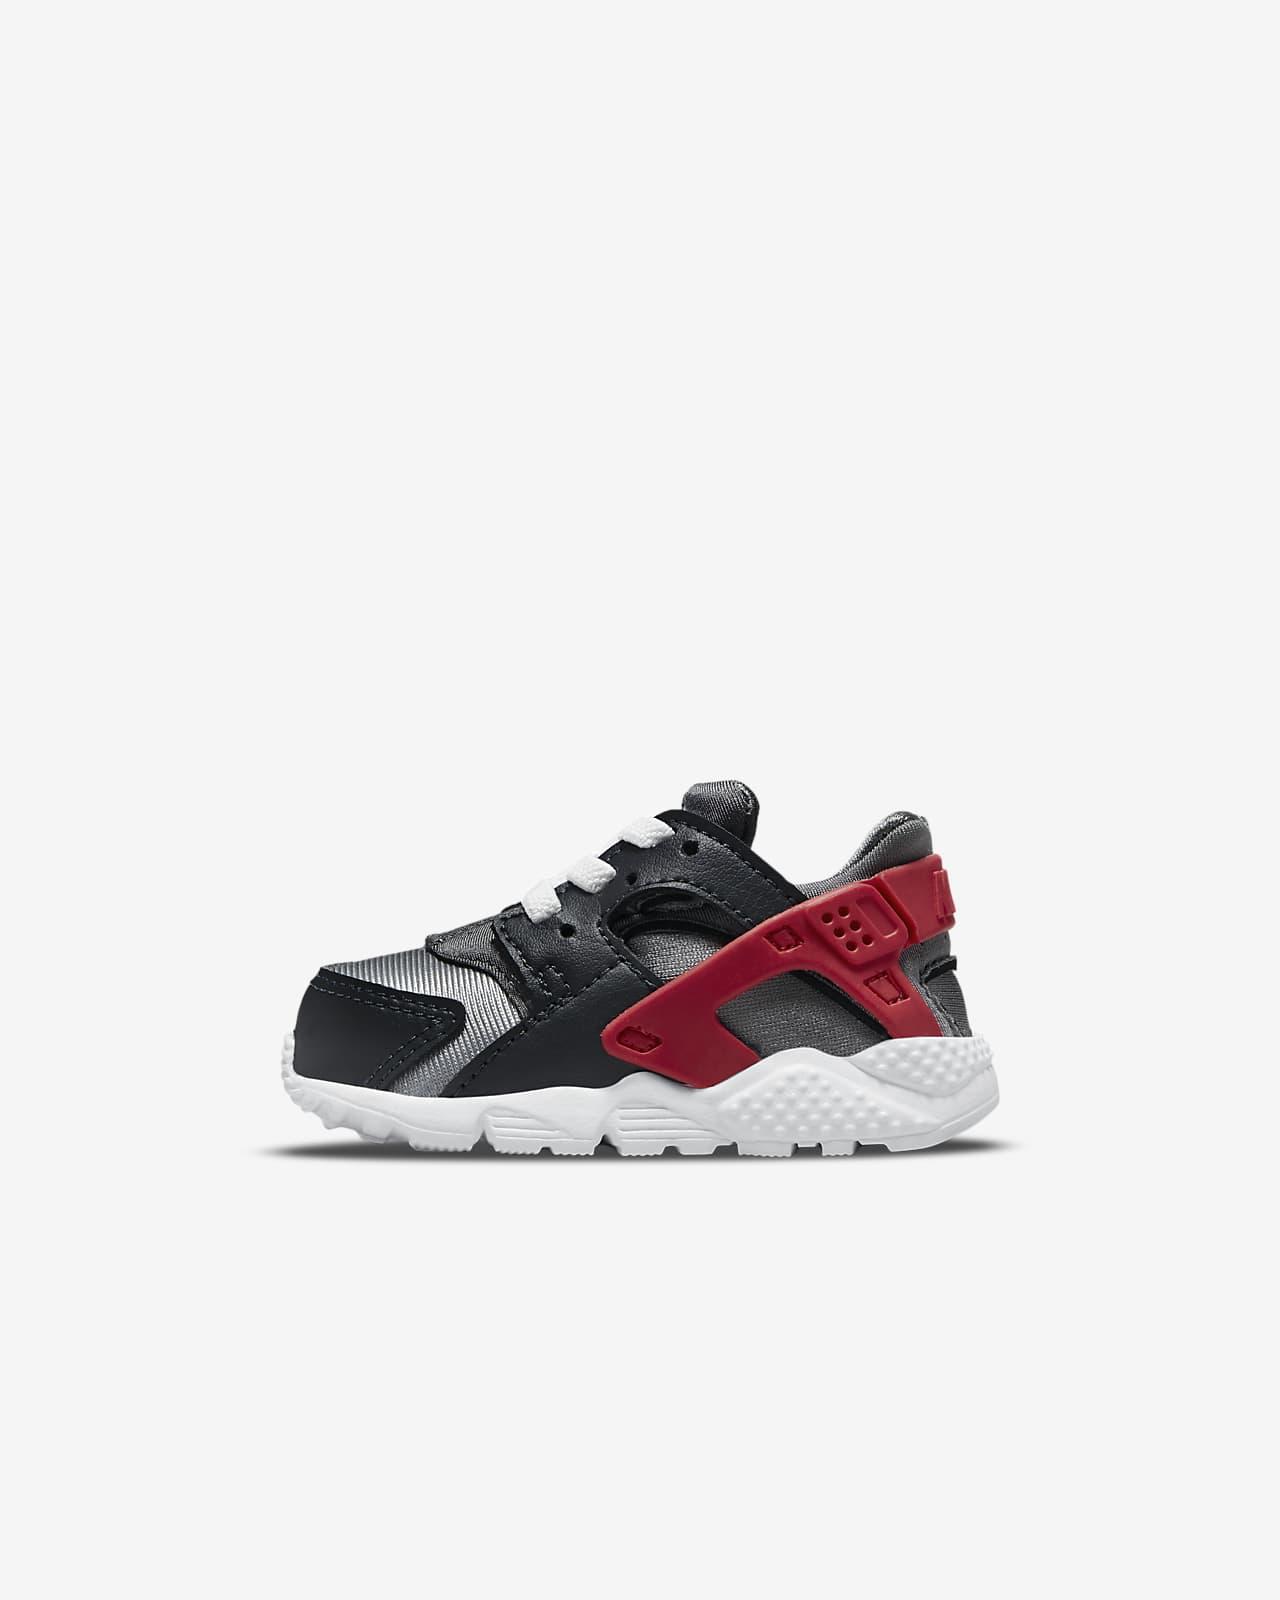 Nike Huarache Run Baby and Toddler Shoe